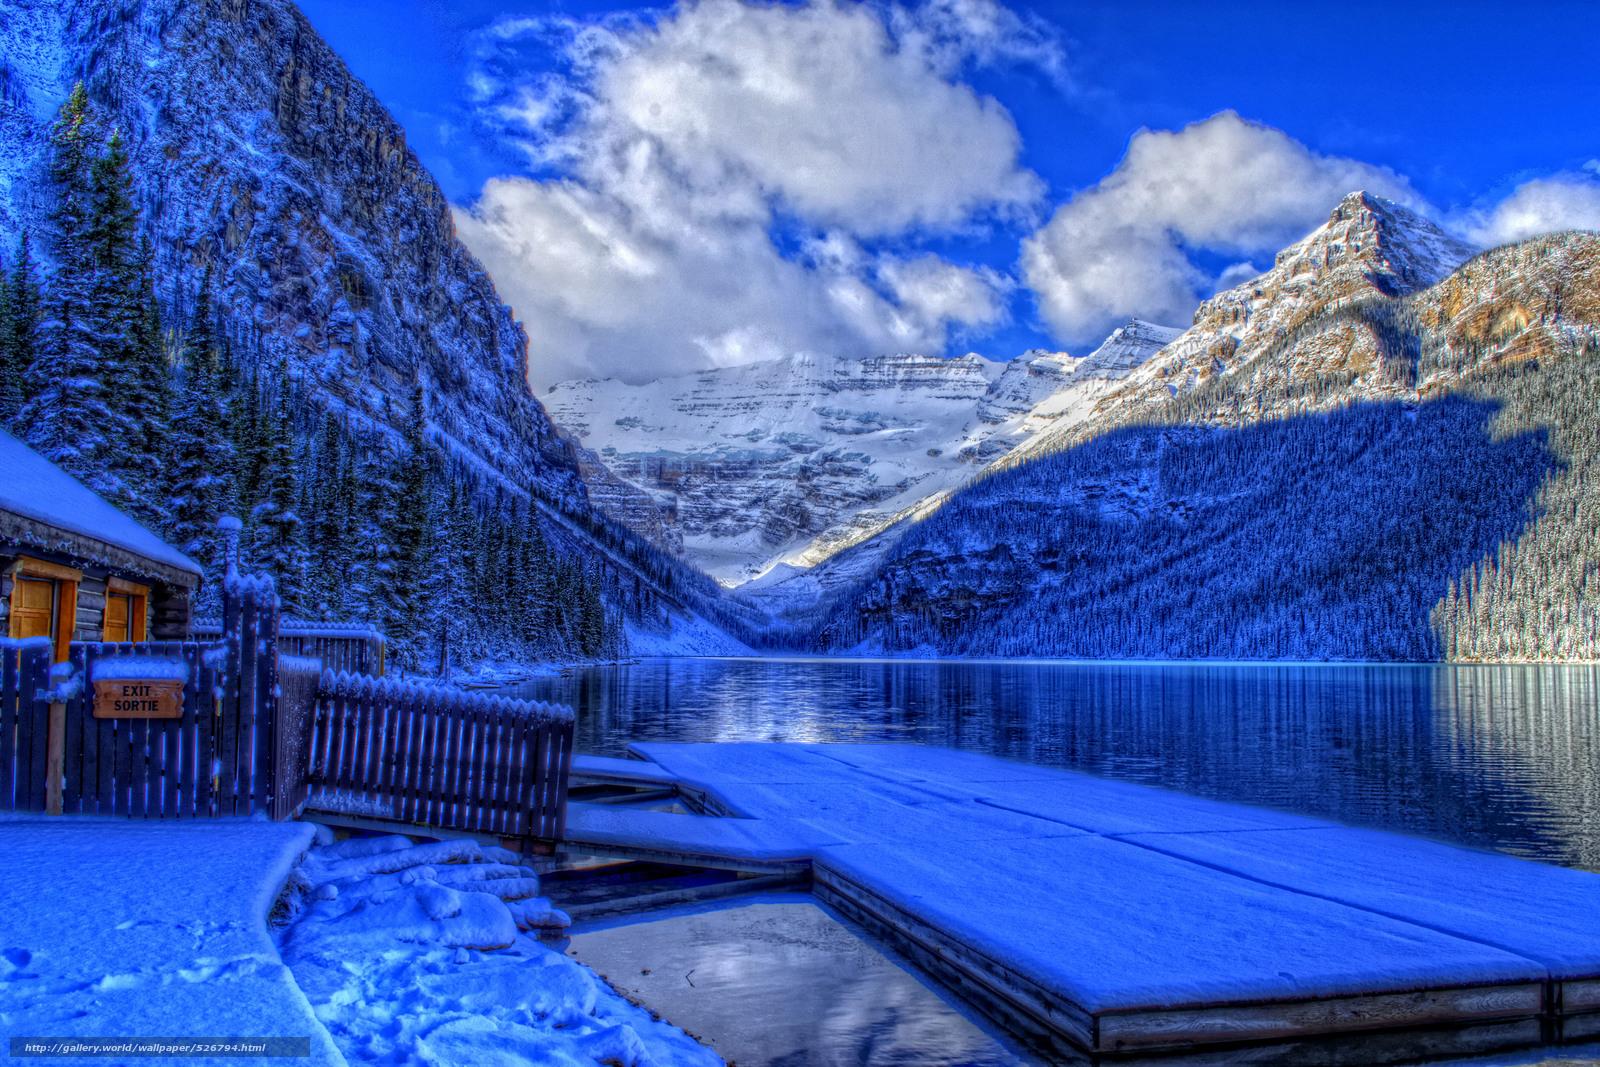 Download wallpaper lake louise banff national park alberta canada 1600x1067